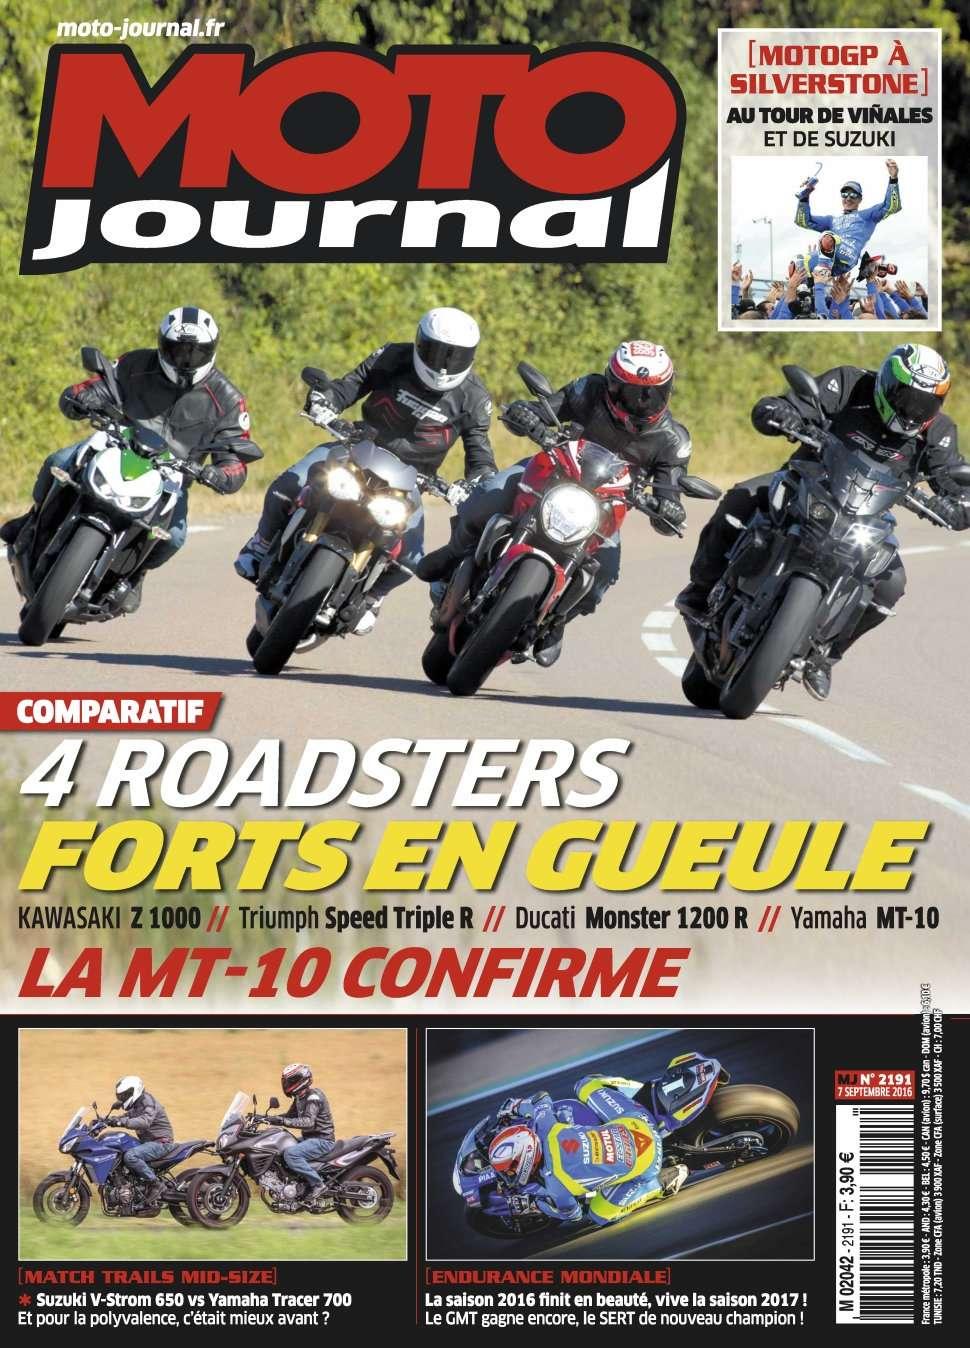 Moto Journal 2191 - 7 Septembre 2016